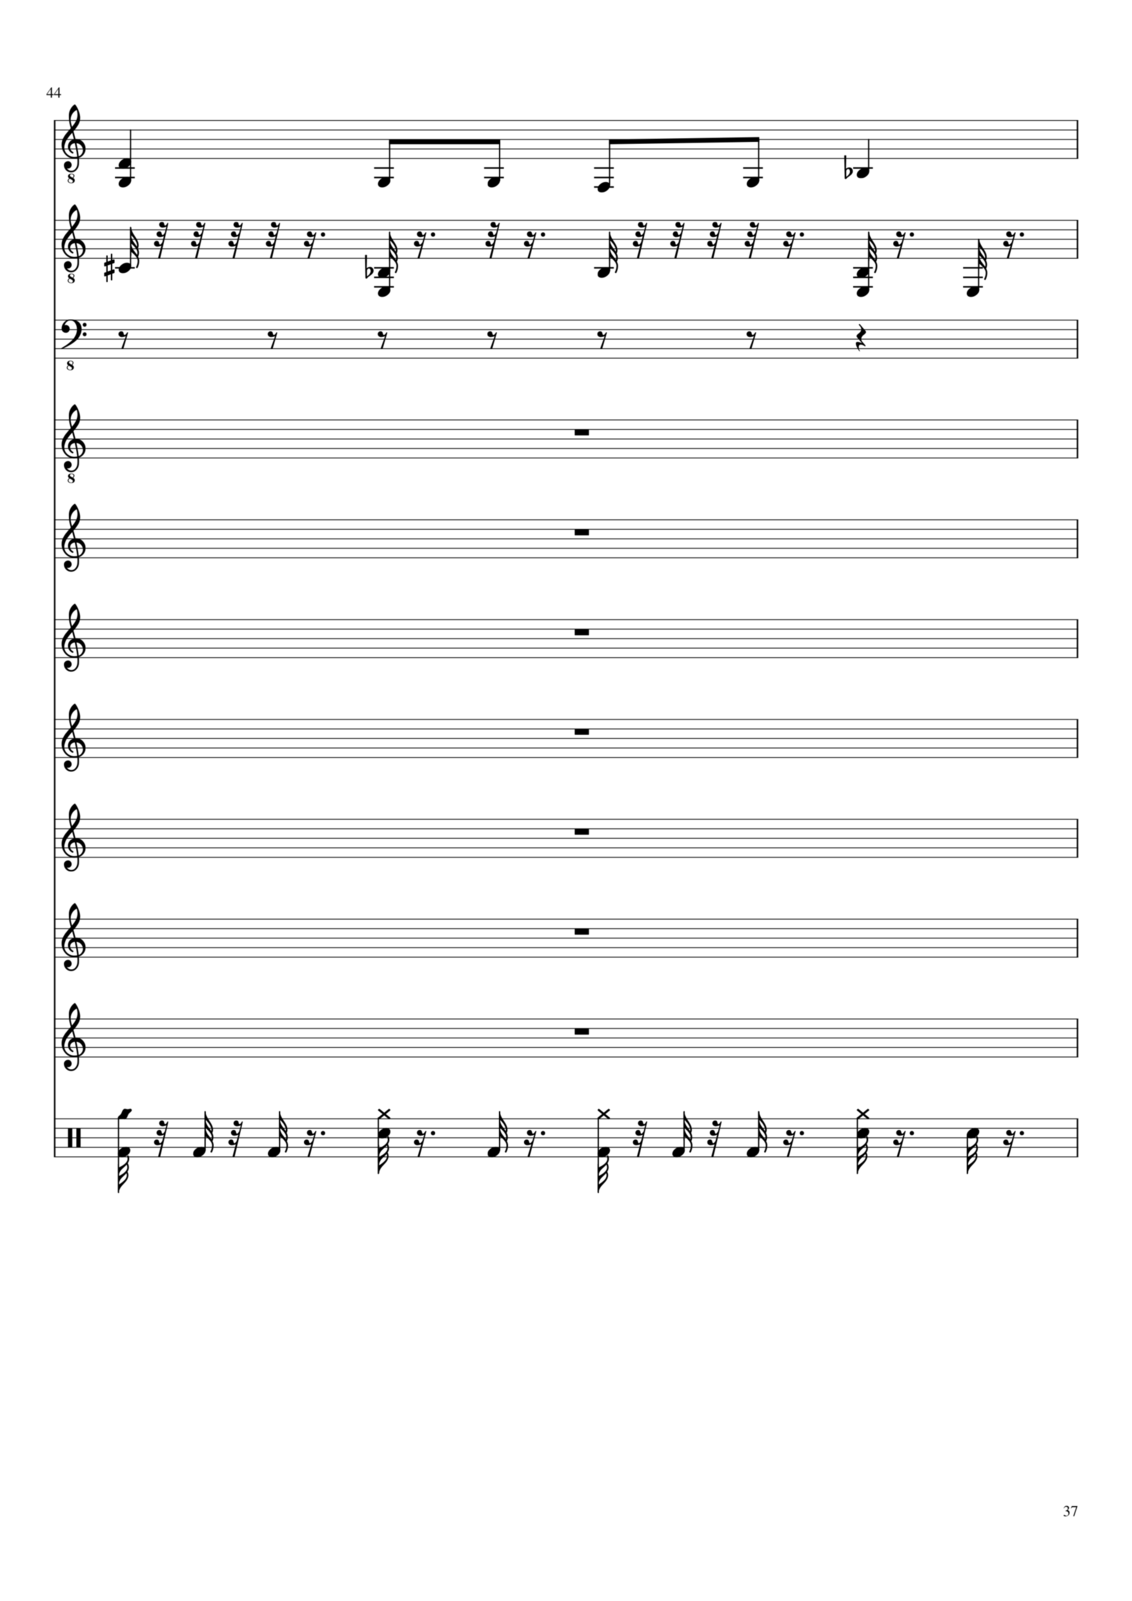 Belyiy sokol slide, Image 37